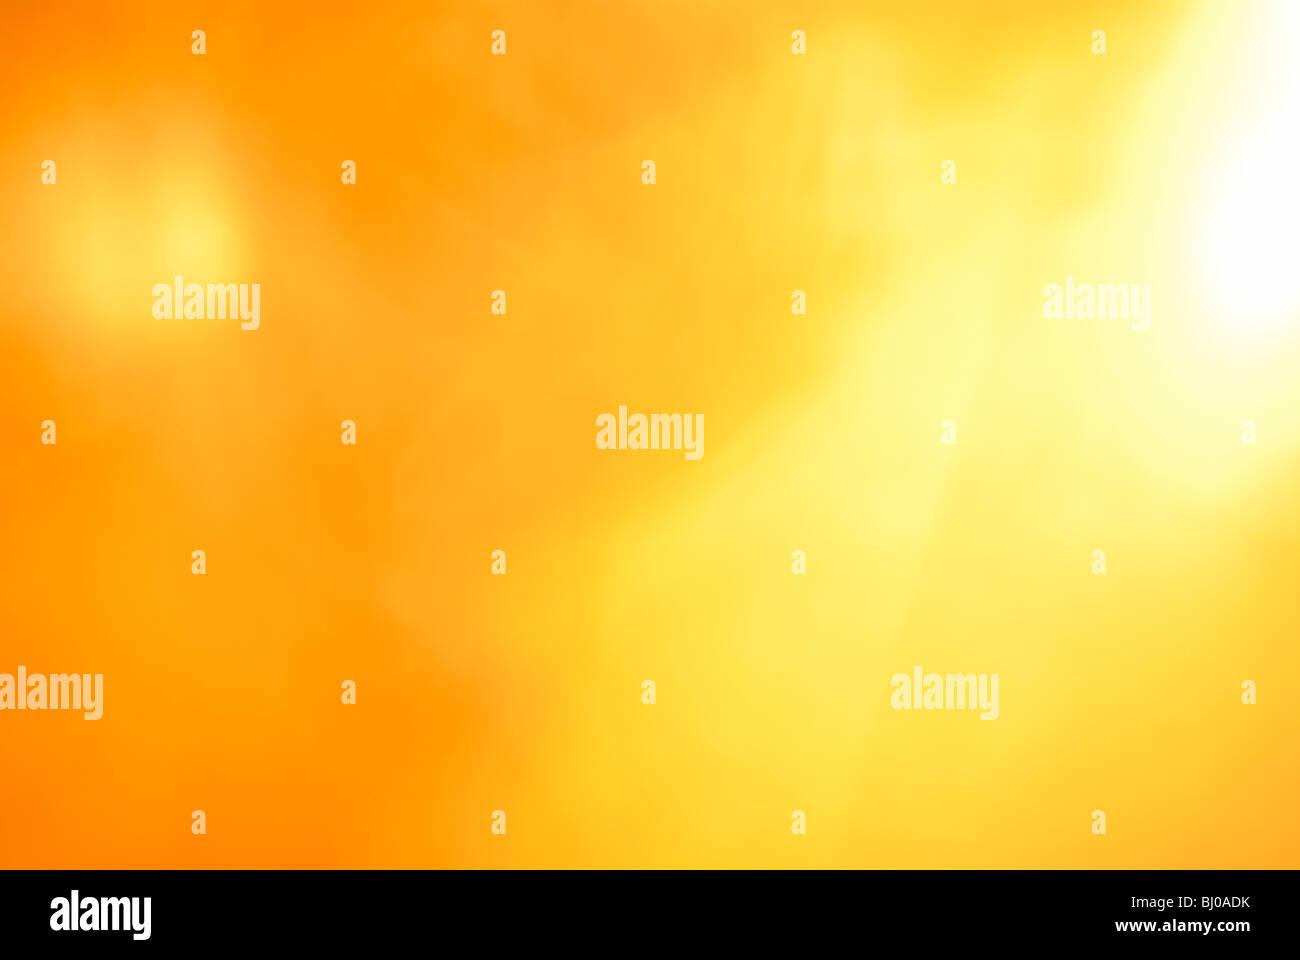 ORANGE AND YELLOW BACKGROUND - Stock Image